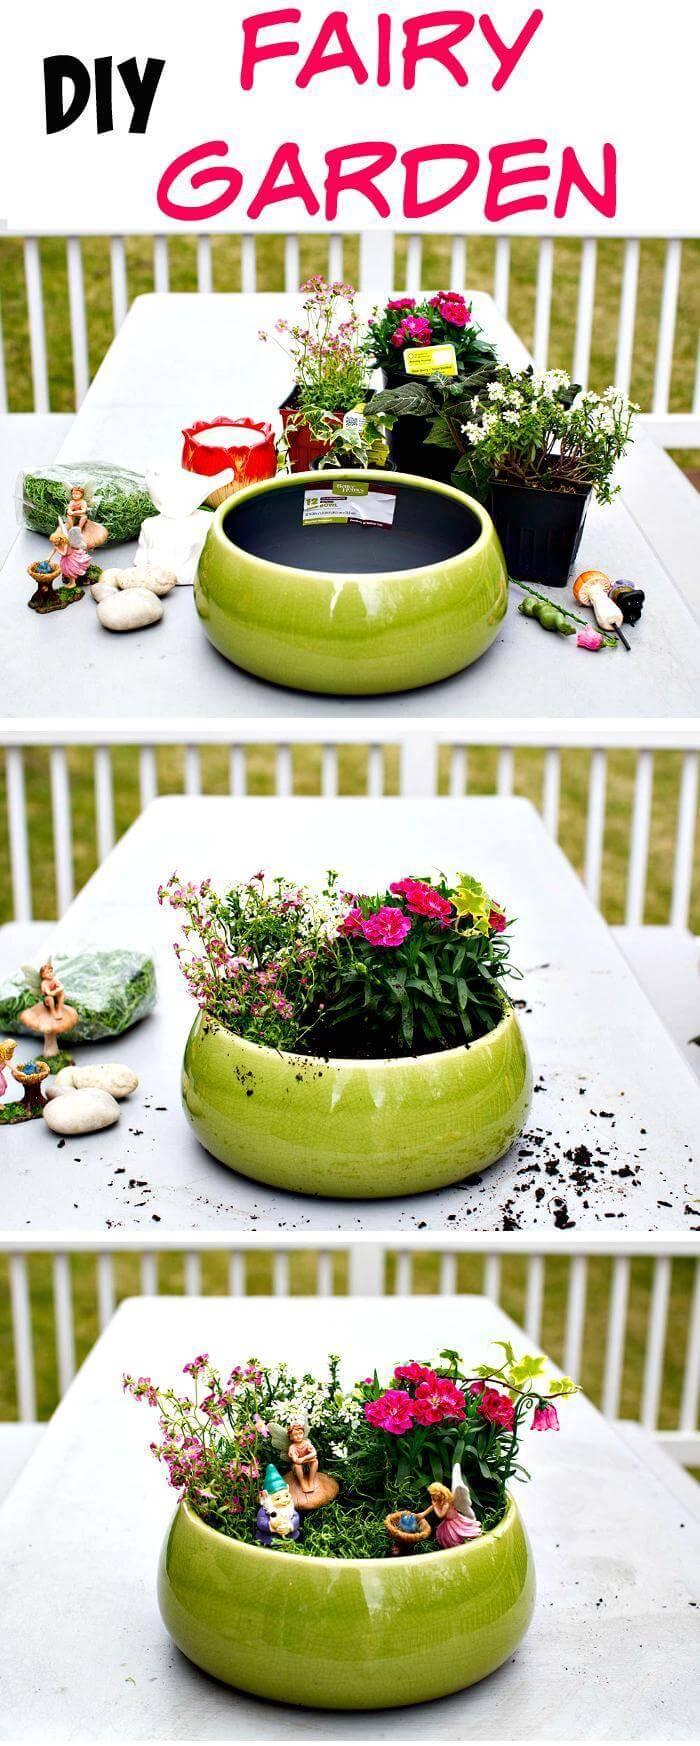 DIY Fairy Garden Step by step tutorial